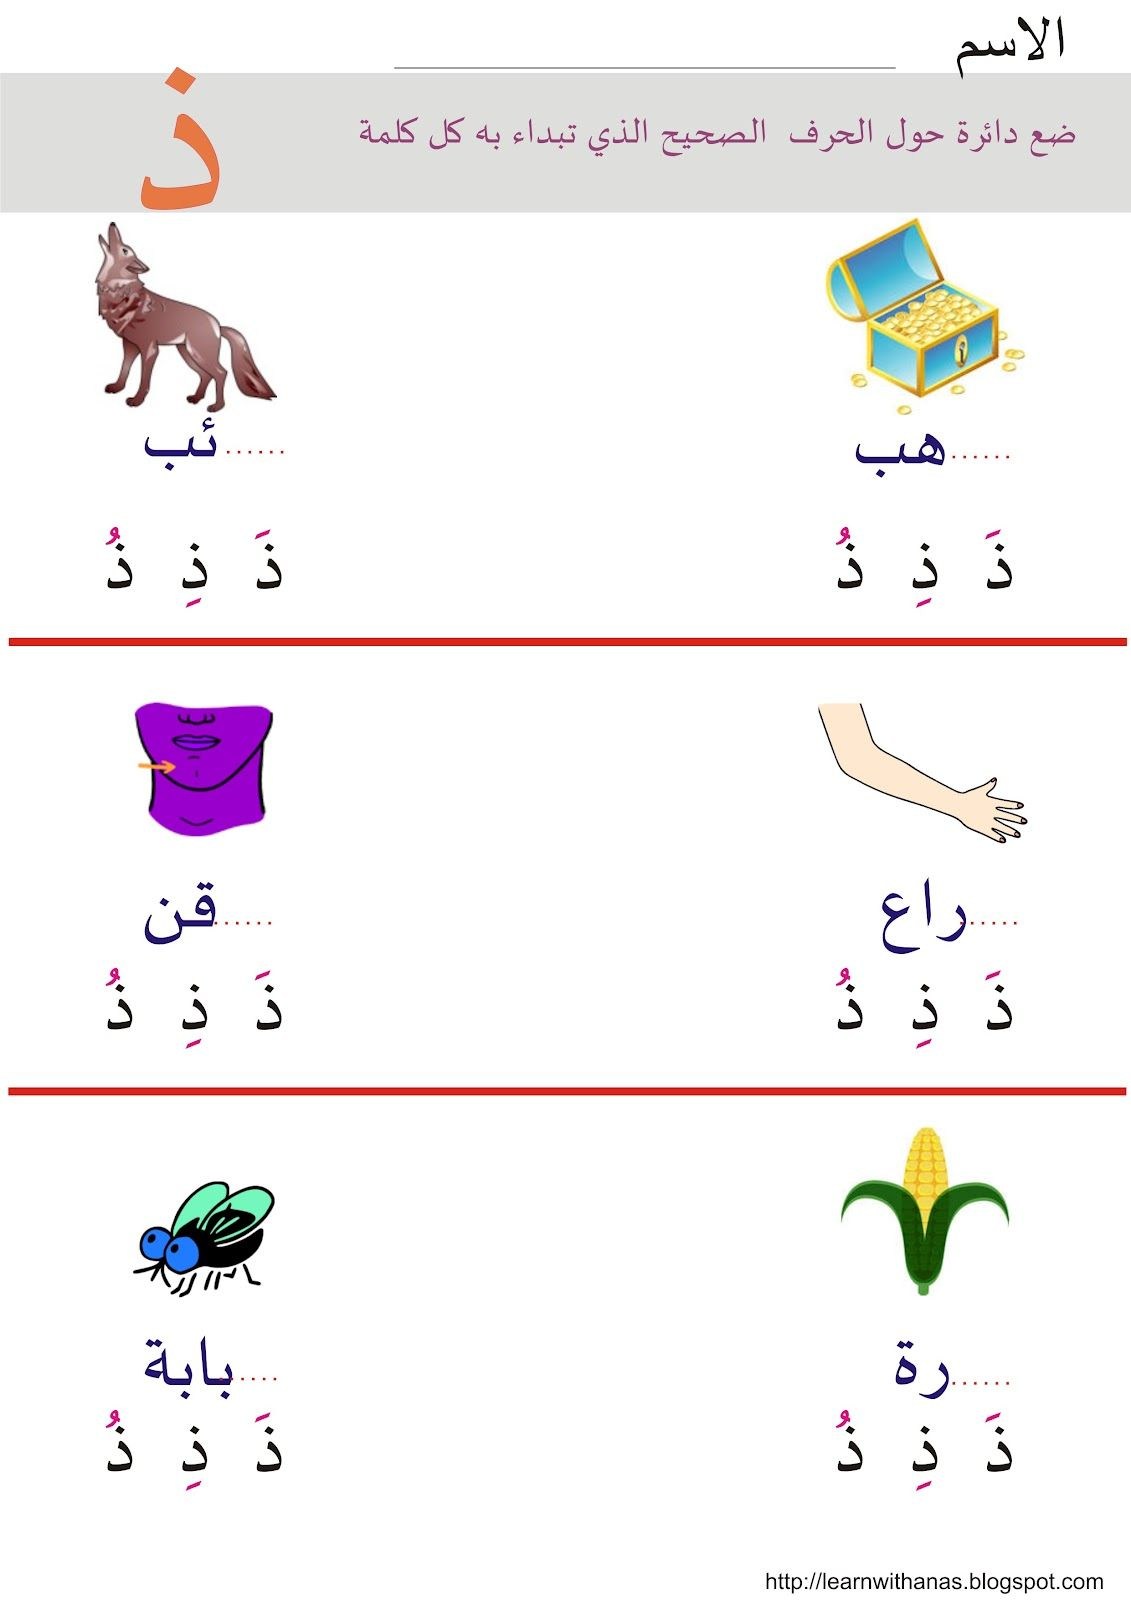 تعلم مع أنس Arabic Alphabet For Kids Learning Arabic Learn Arabic Online